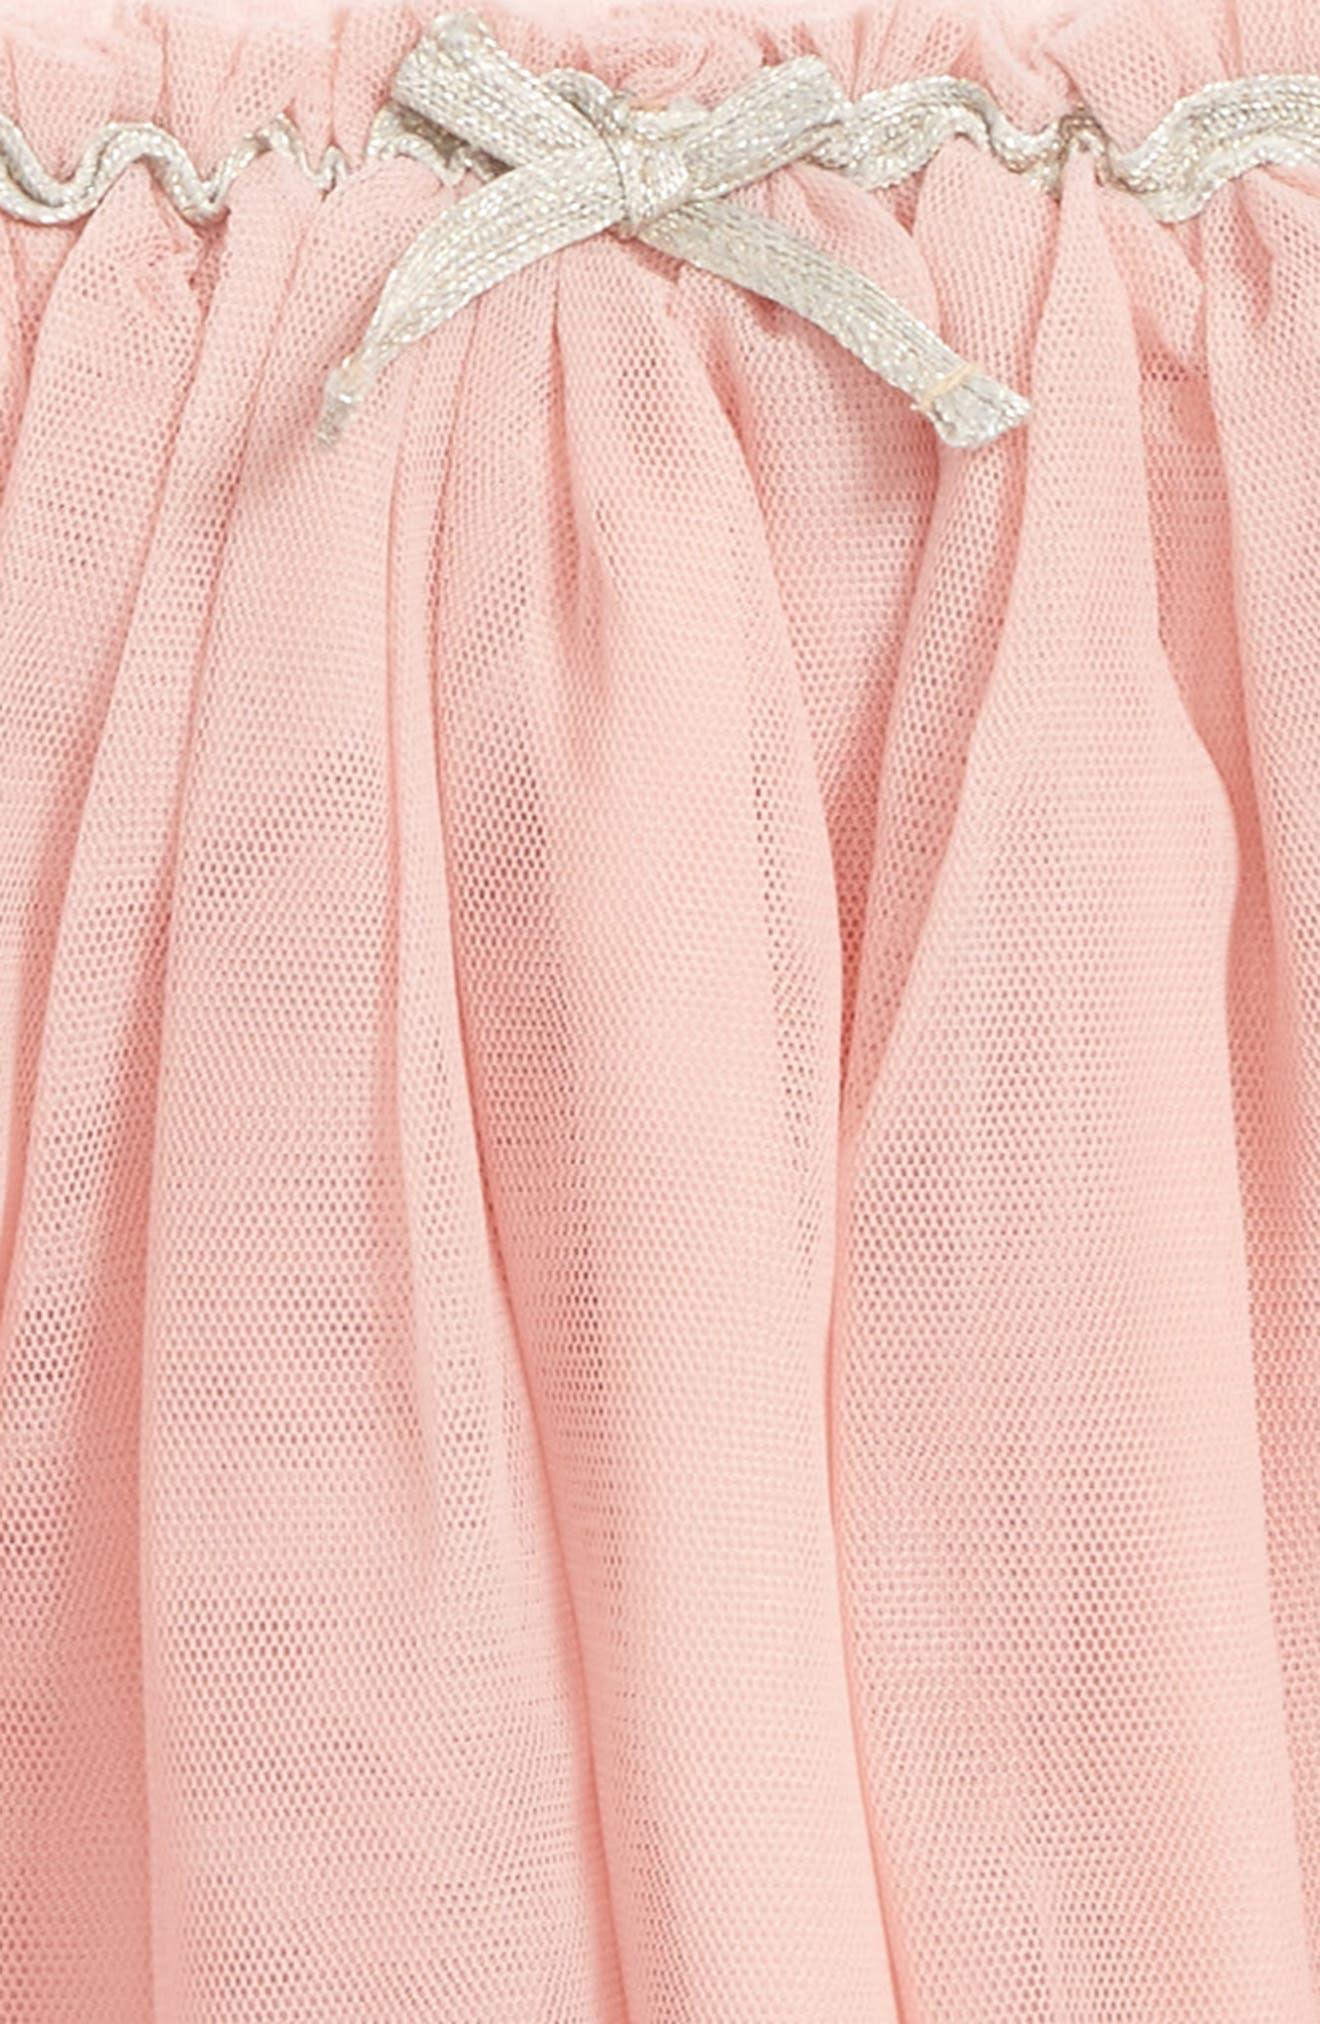 Tutu Leggings,                             Alternate thumbnail 2, color,                             Pink Silver